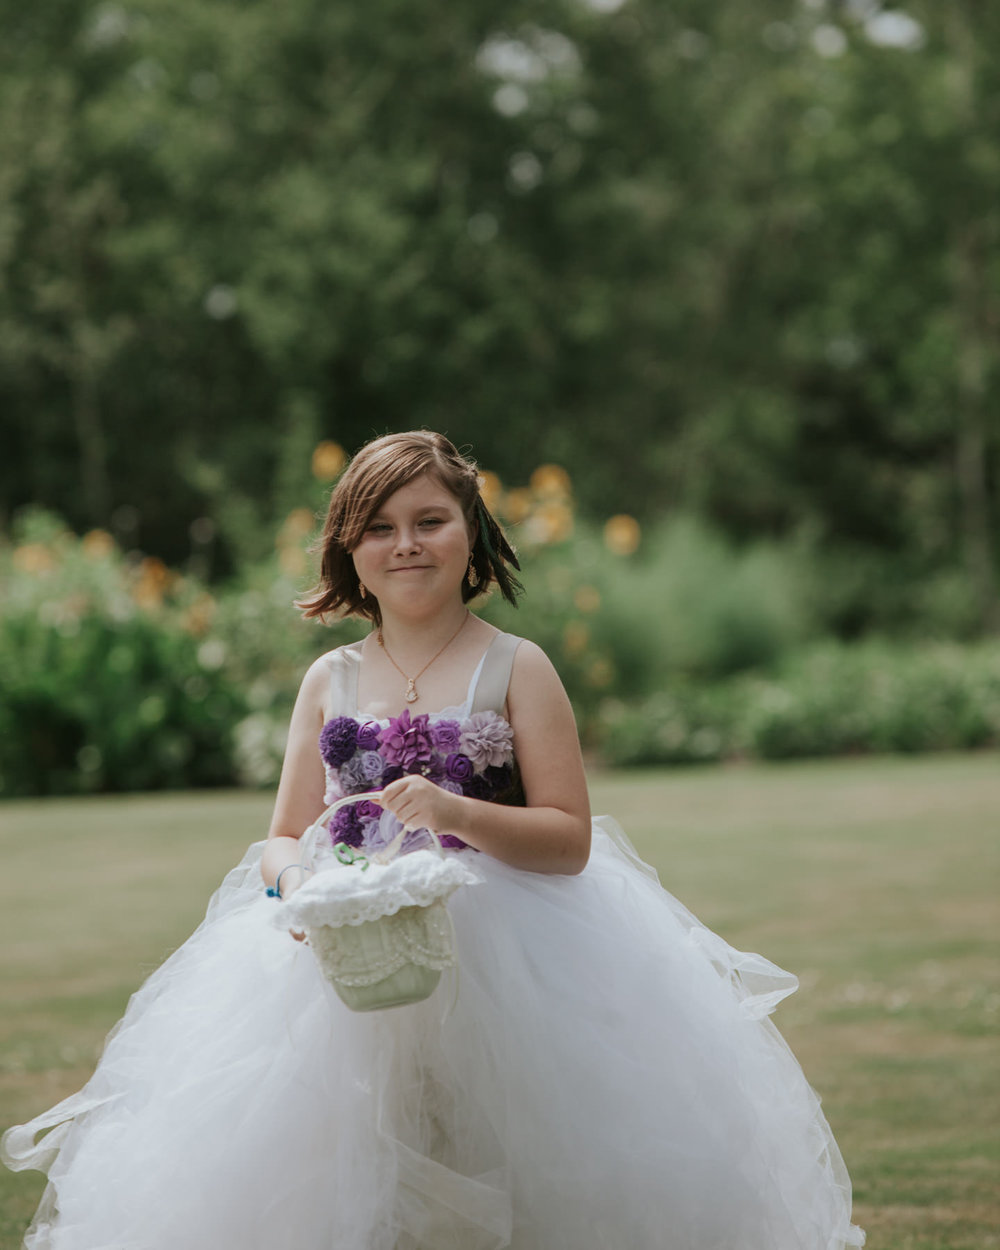 Vancouver Wedding Photographer Pam (20).jpg